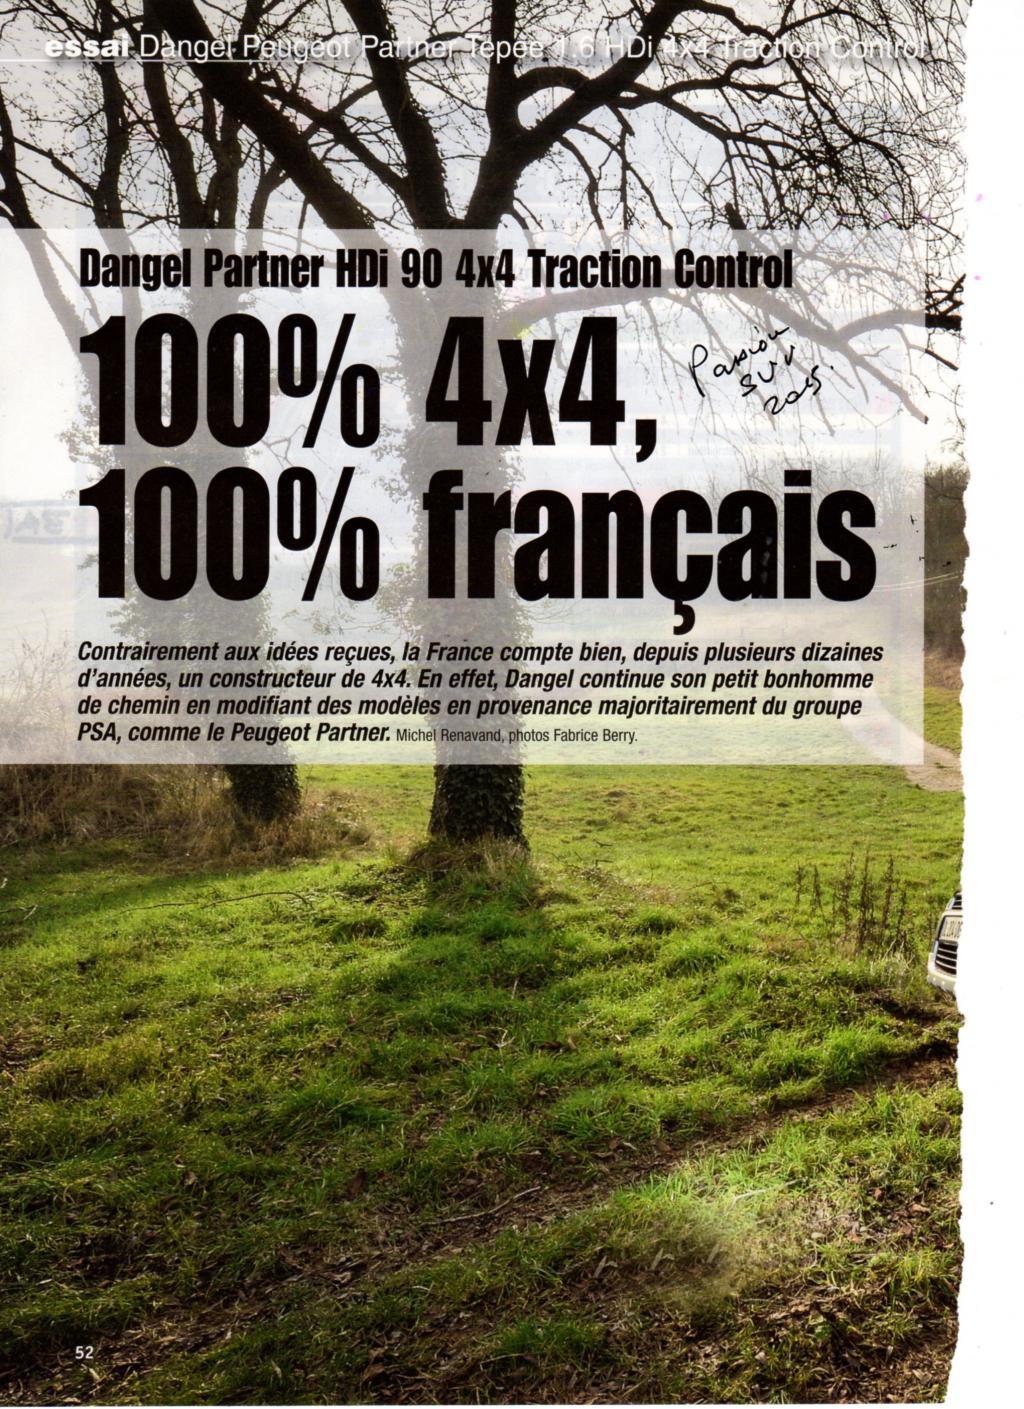 passion suv 100 fran ais 100 4x4 partner hdi 90 cvs revu par dangel. Black Bedroom Furniture Sets. Home Design Ideas